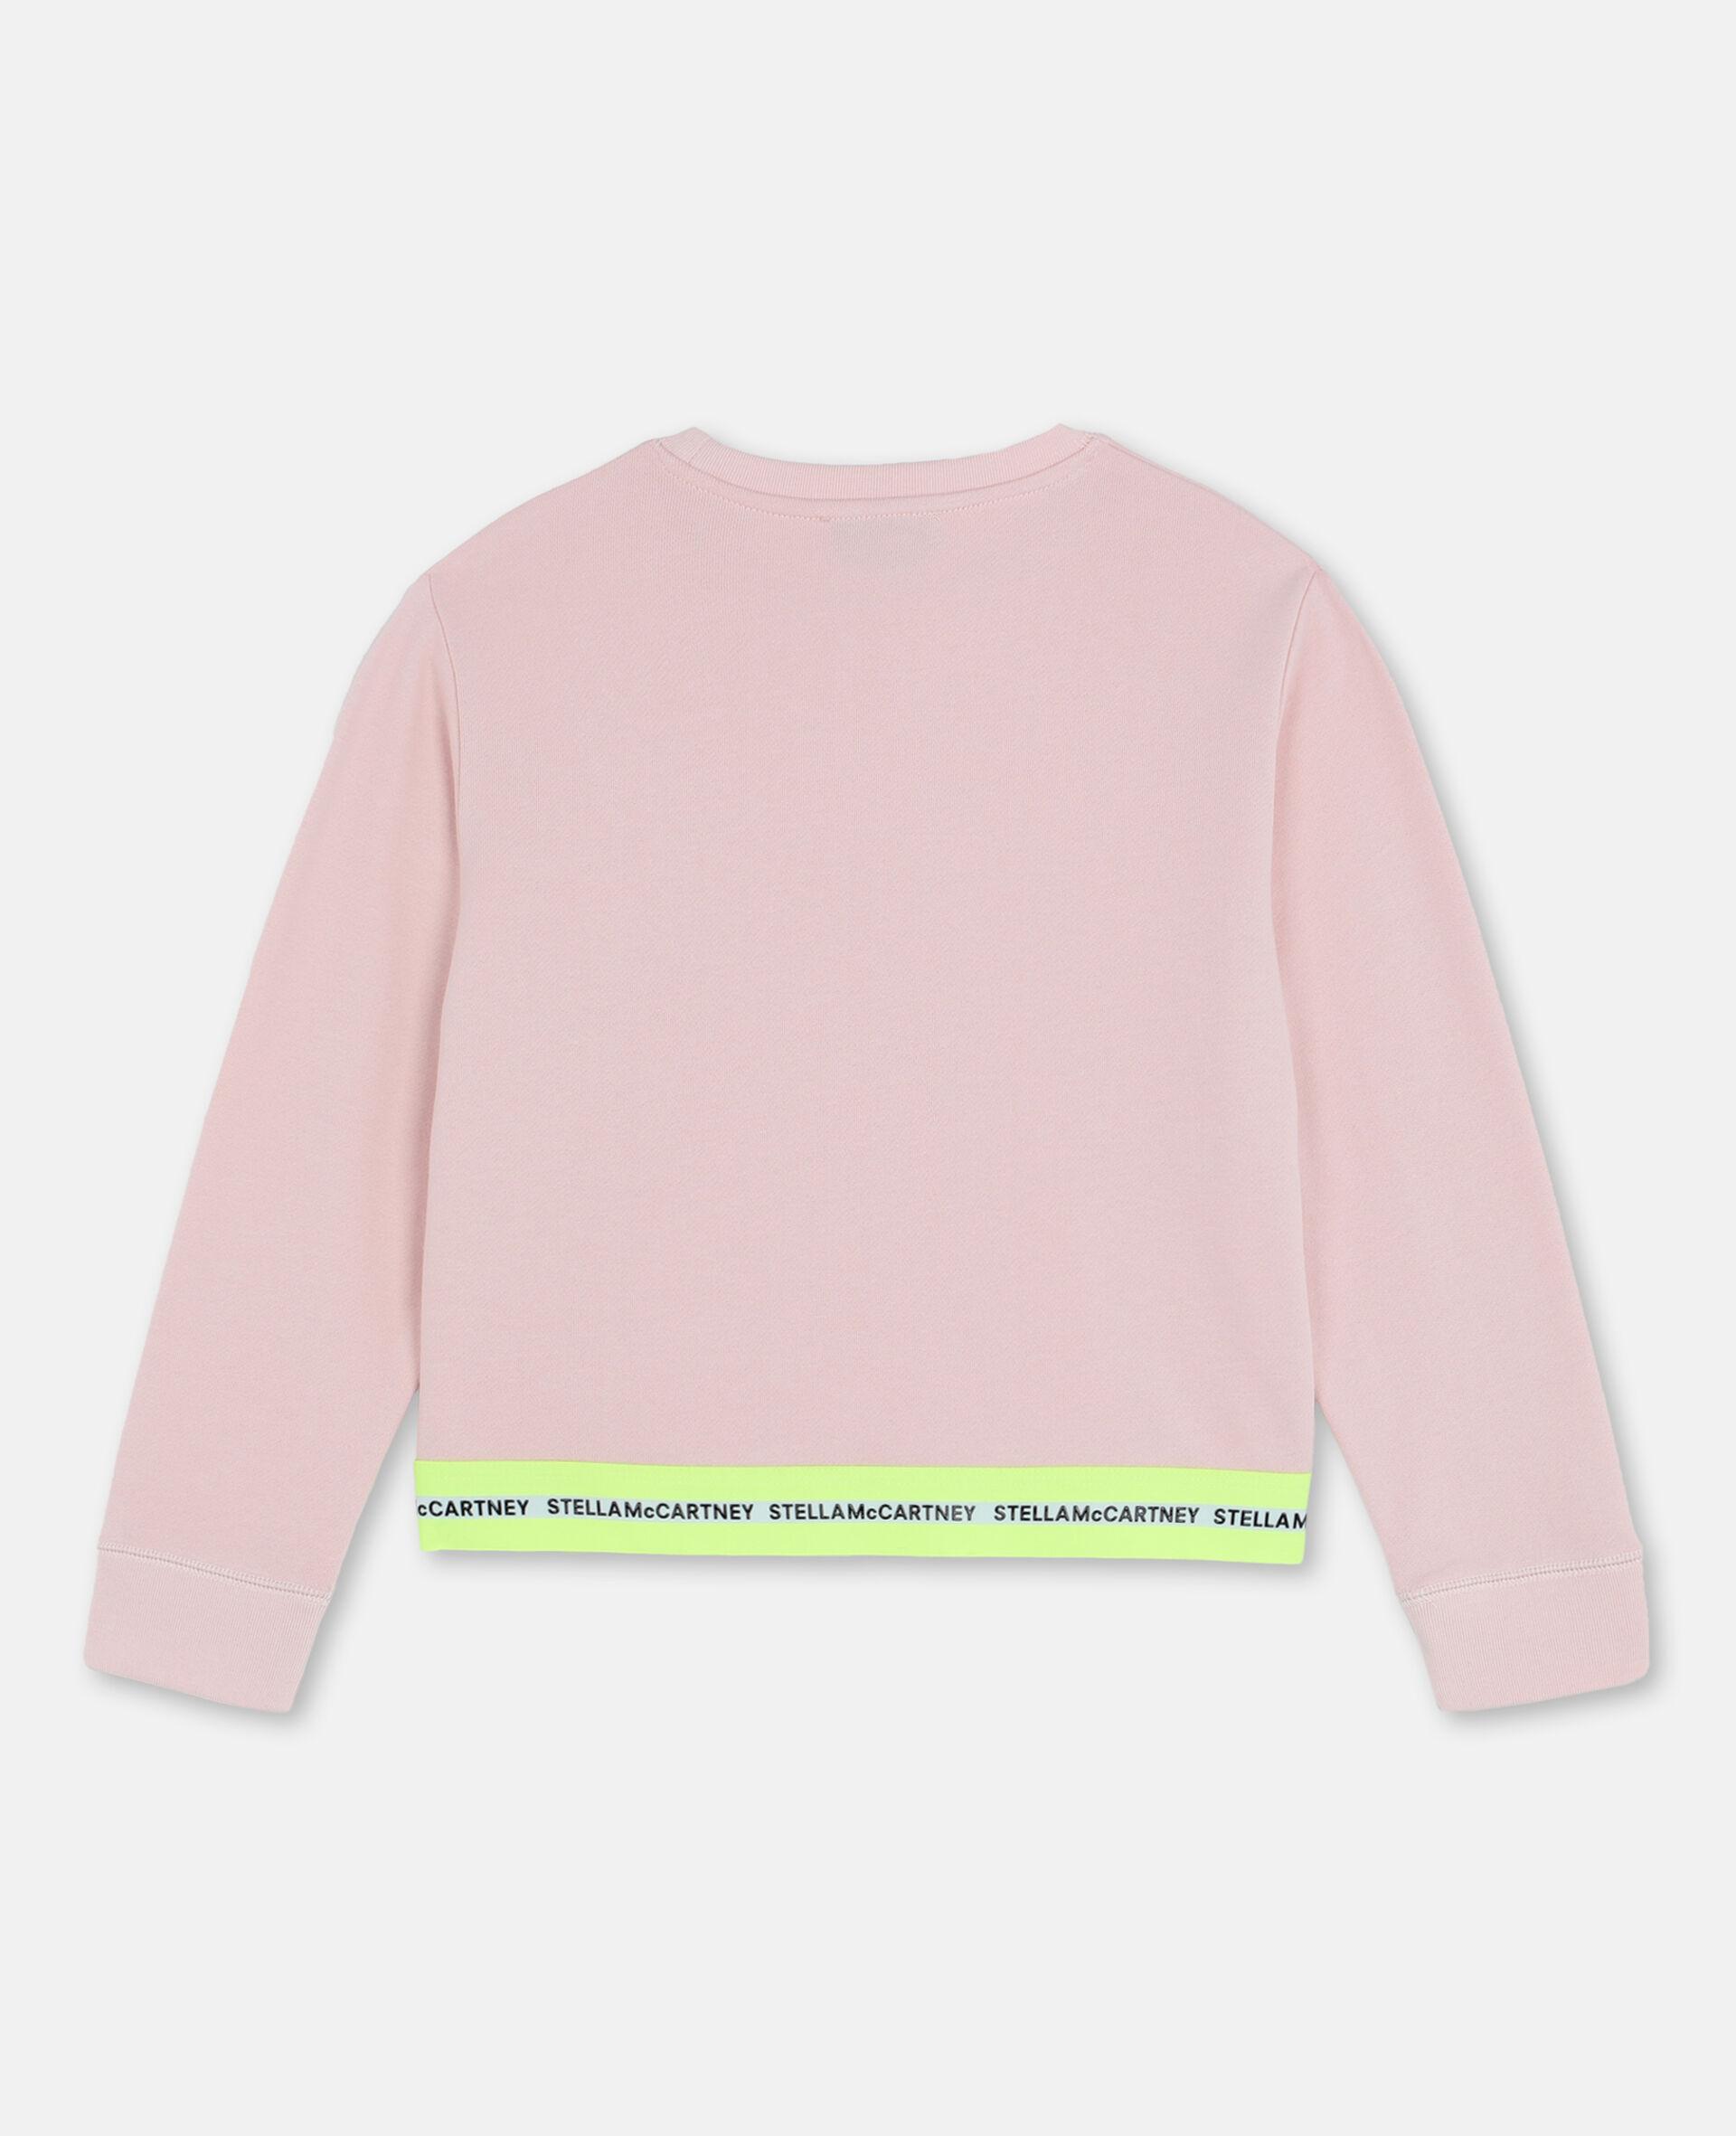 Sportliches Baumwollfleece-Sweatshirt mit Logo-Rose-large image number 3